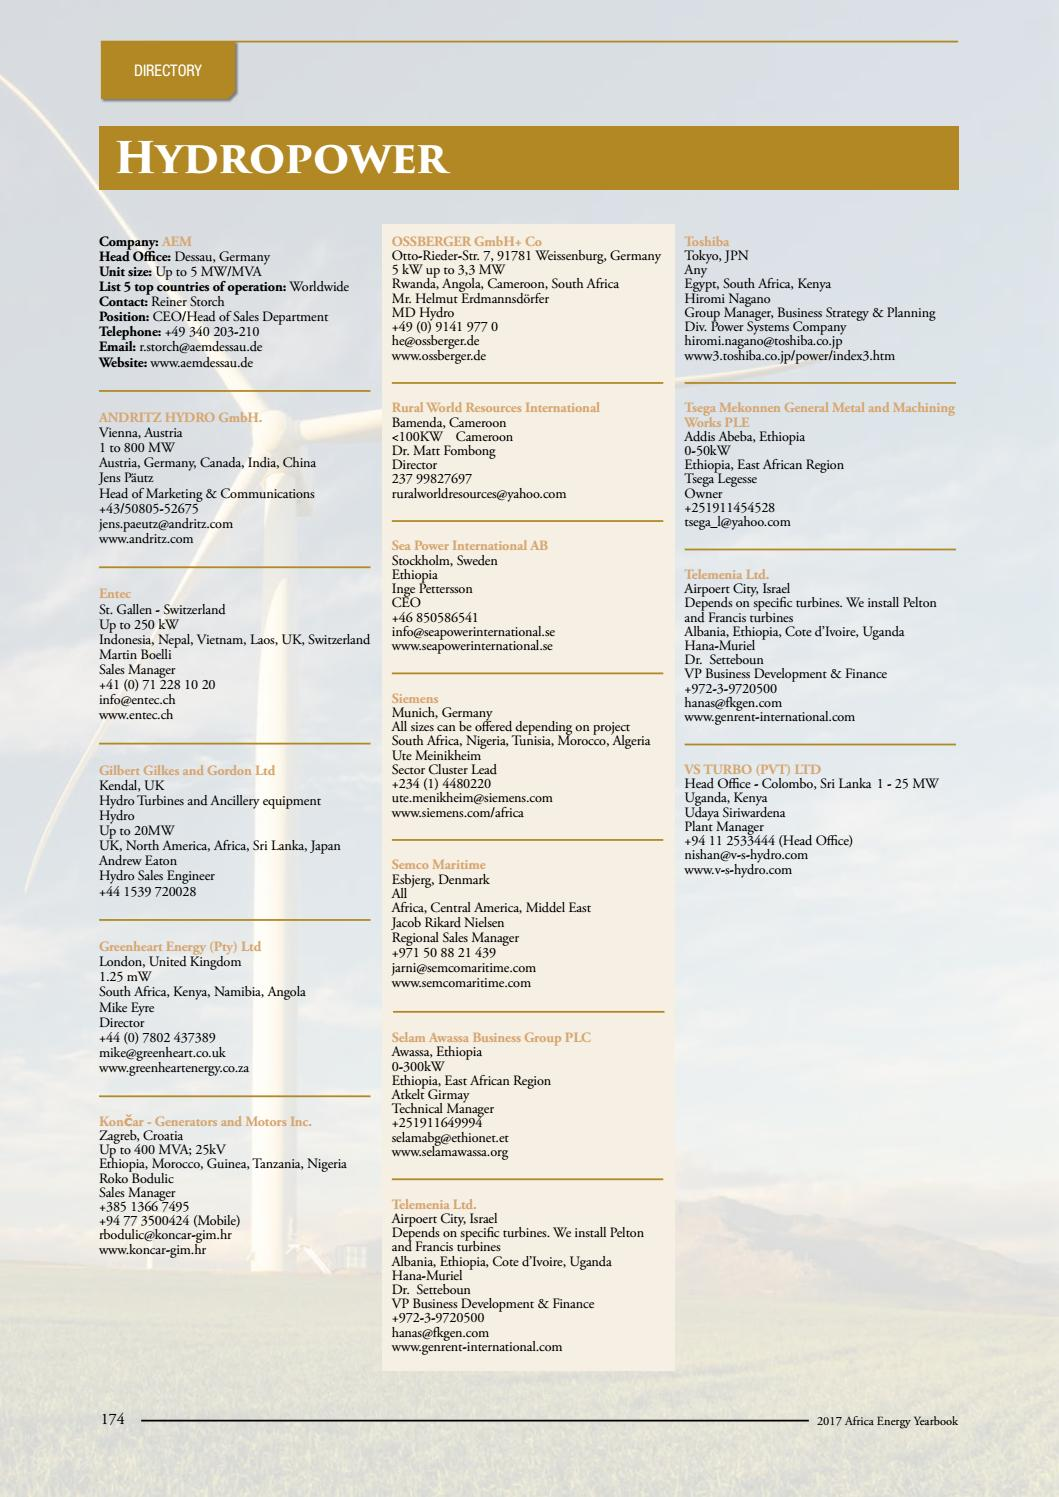 Africa Energy Yearbook 2017 - full book by EnergyNet - issuu